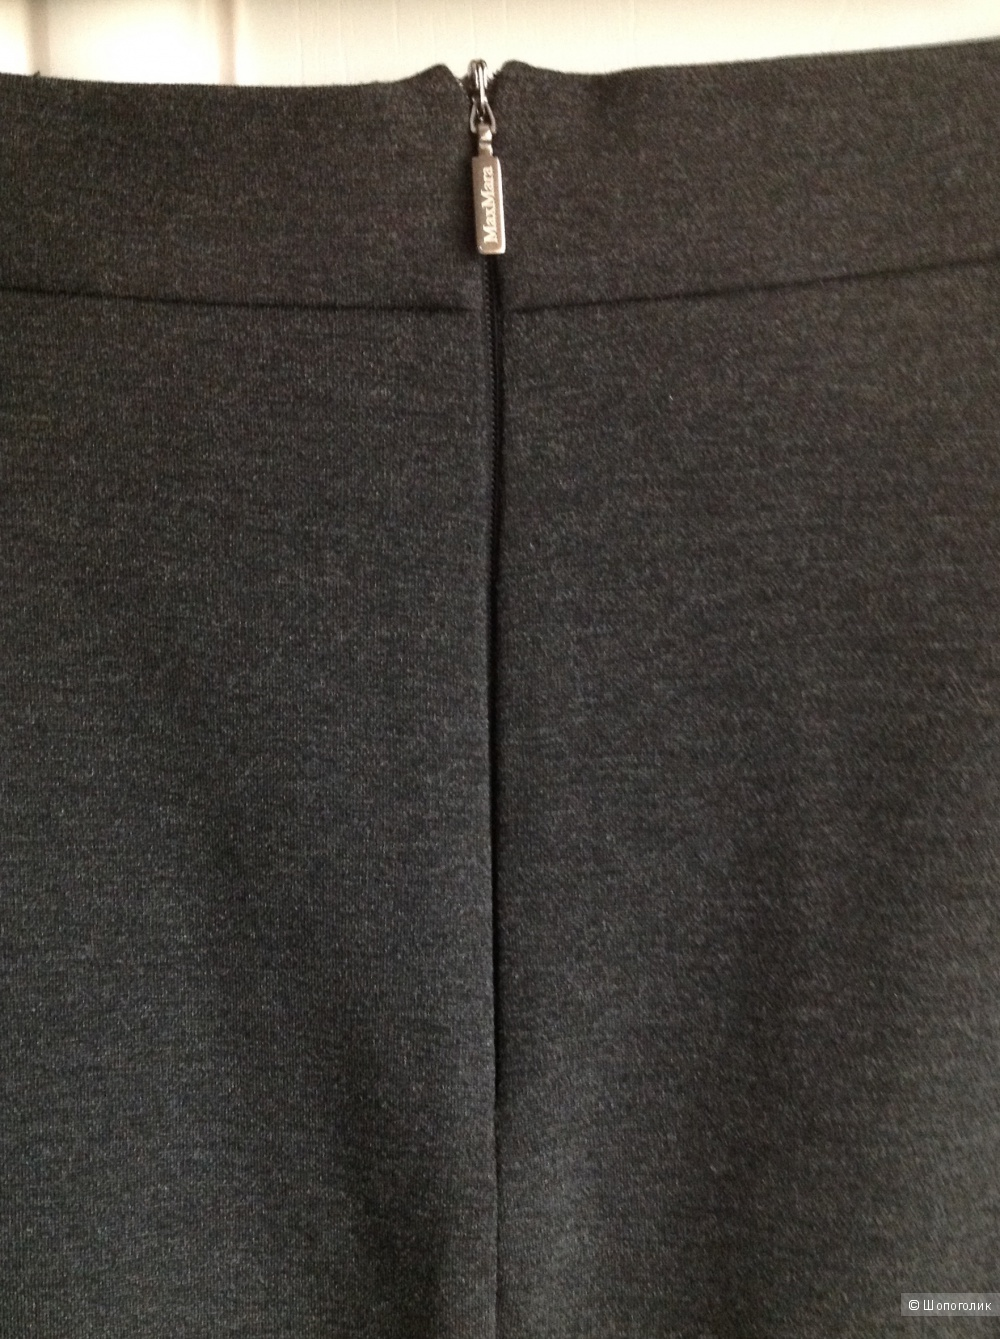 Юбка-карандаш Max Mara, размер 46.